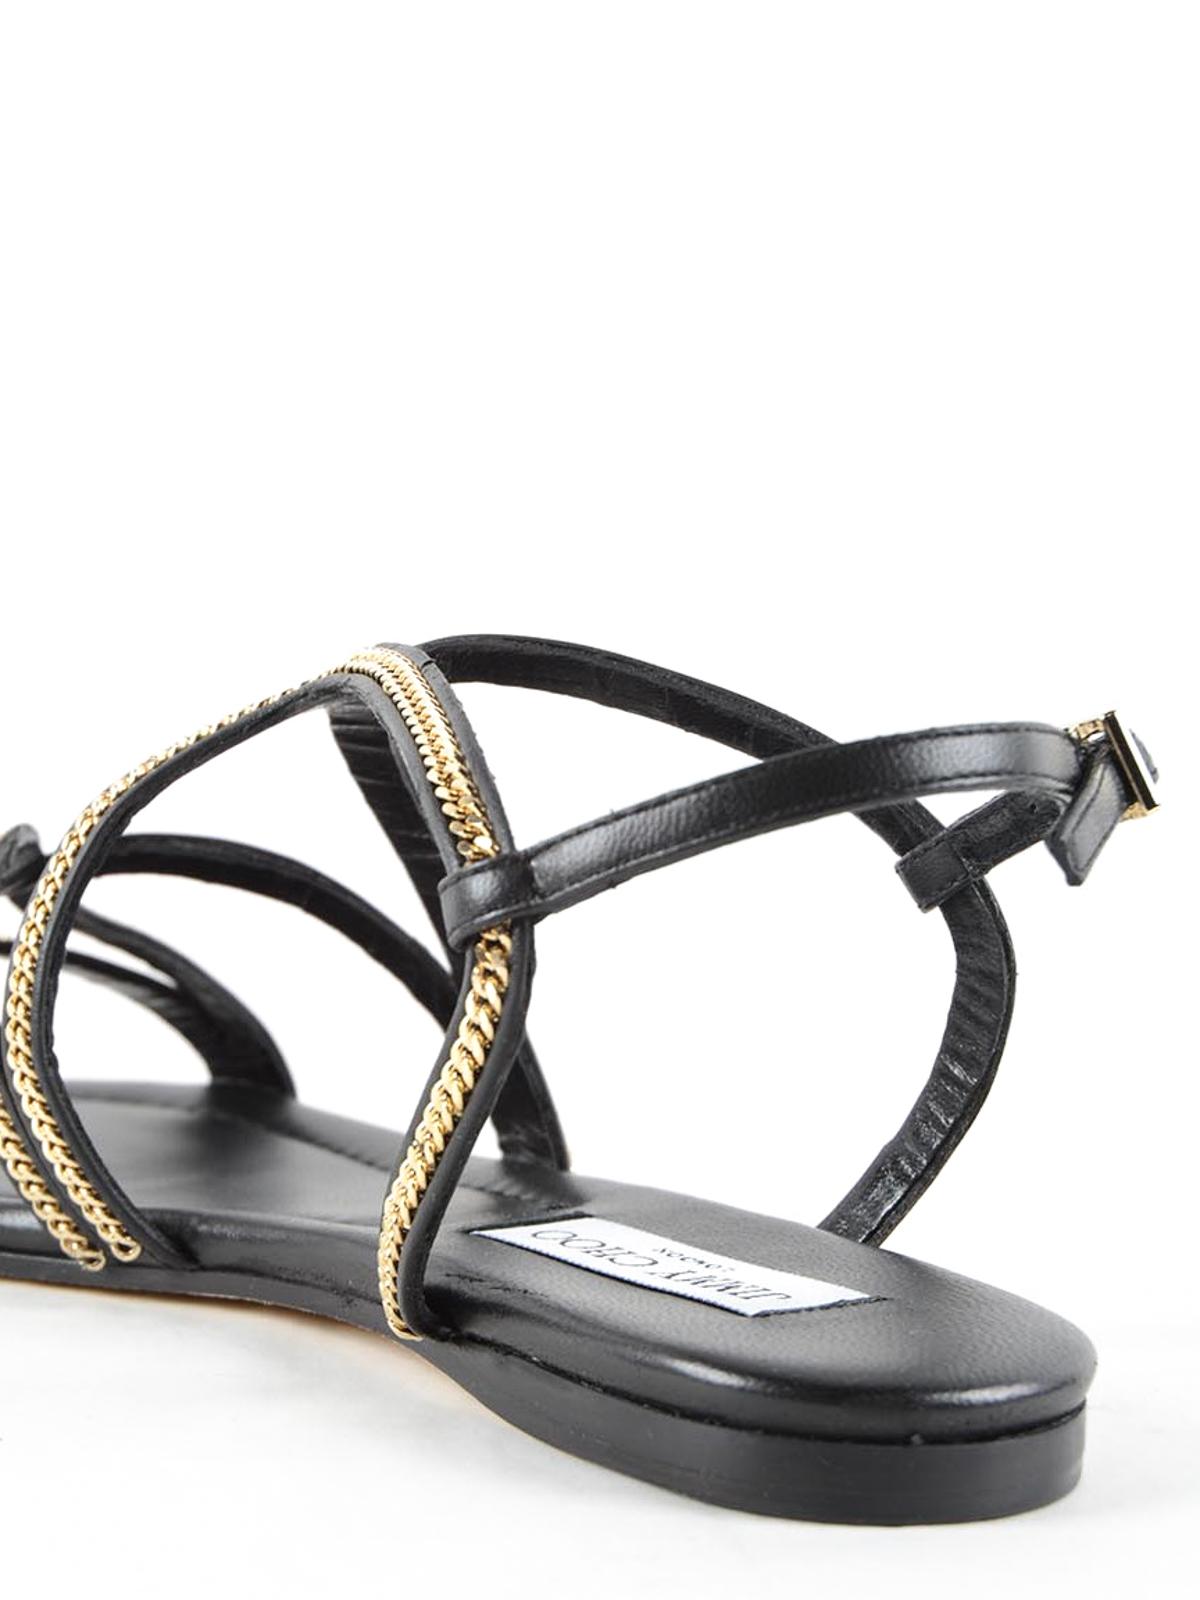 40d7c4779c2 Jimmy Choo - Nickel Flat sandals with chain - sandals - NICKEL FLAT ...